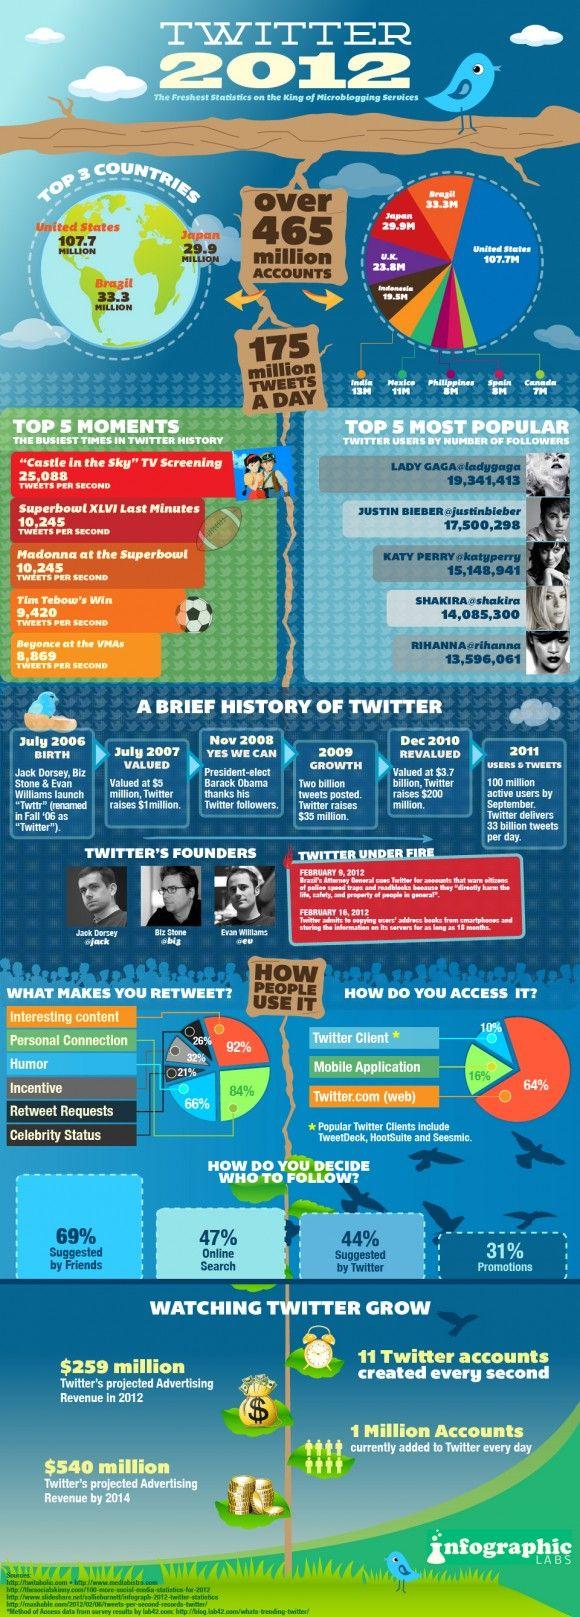 Twitter 2012 #Infographic #flowchart